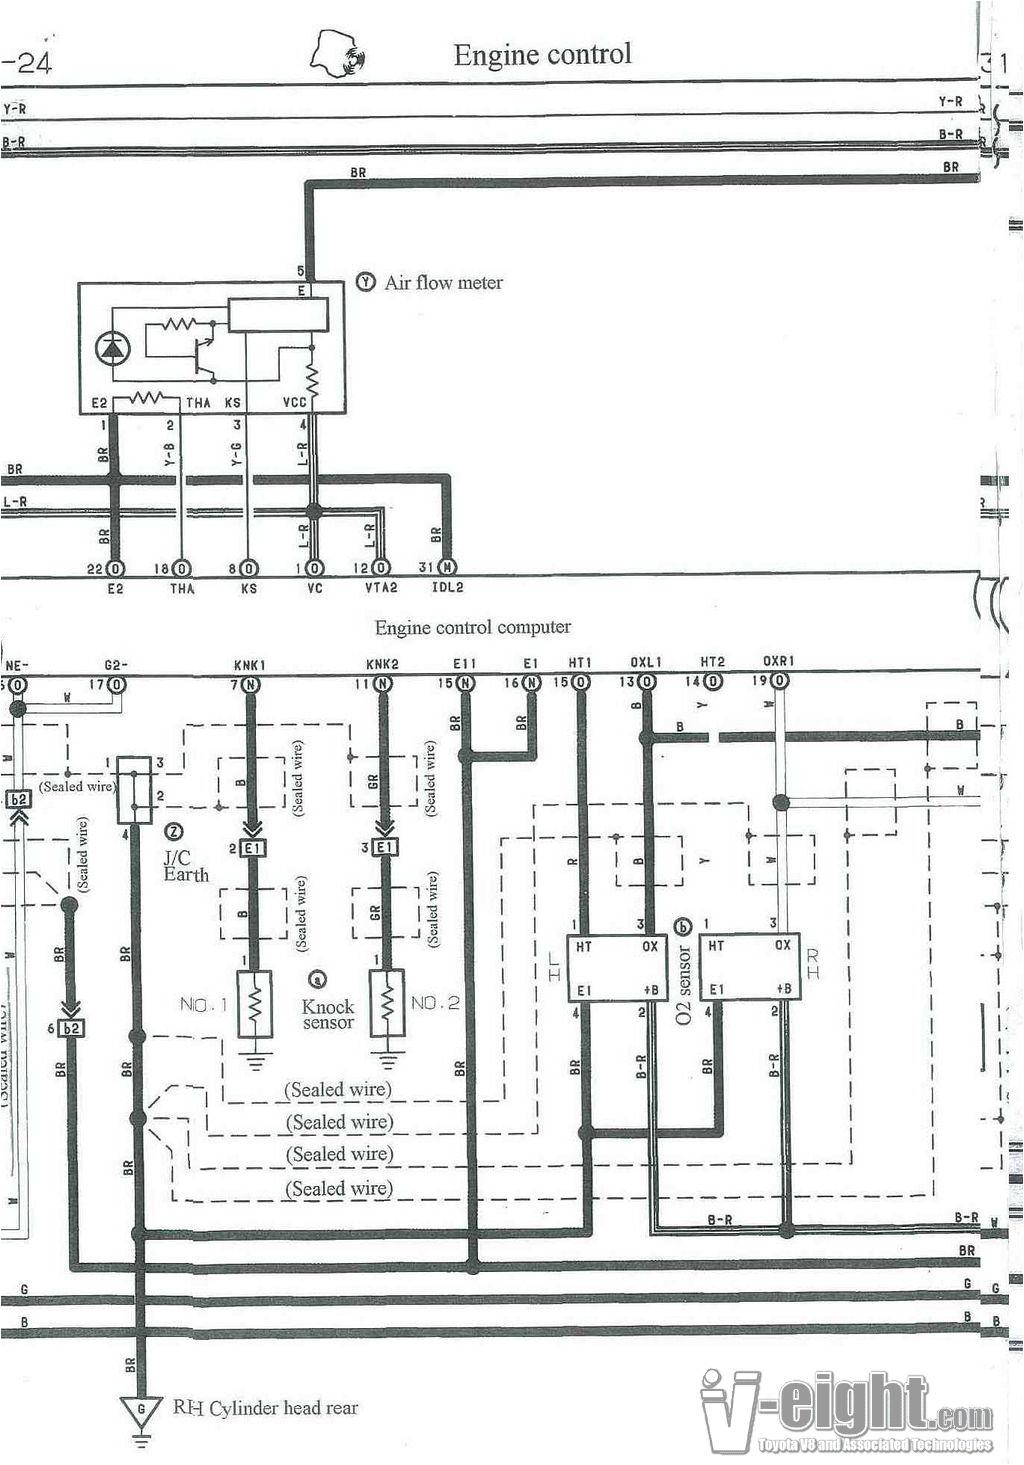 as well s13 wiring harness diagram besides sr20det alternator wiring mix wiring diagram moreover s13 ka24de